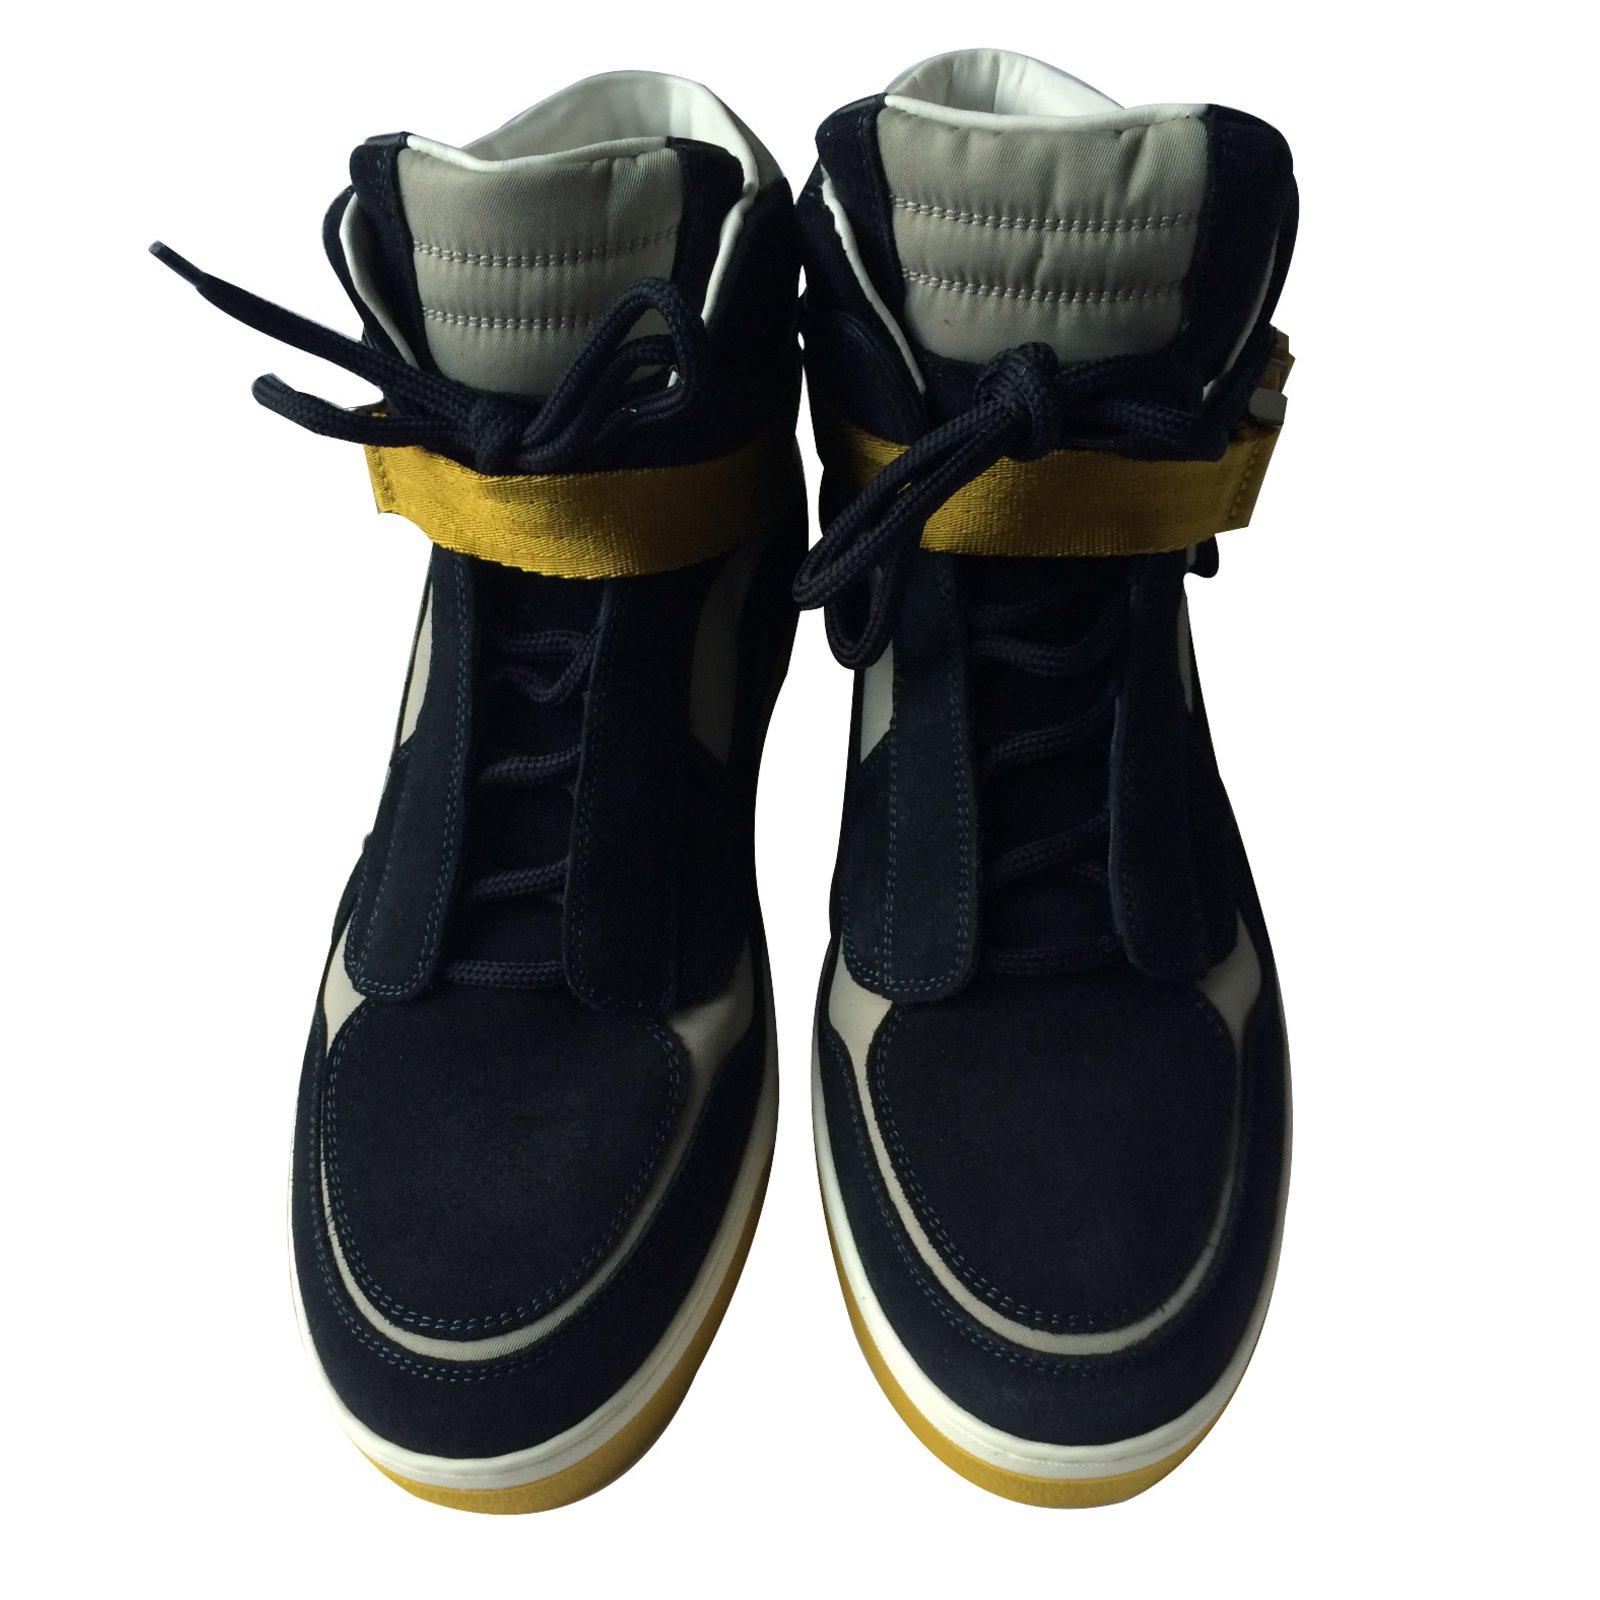 baskets homme louis vuitton sneakers daim bleu. Black Bedroom Furniture Sets. Home Design Ideas